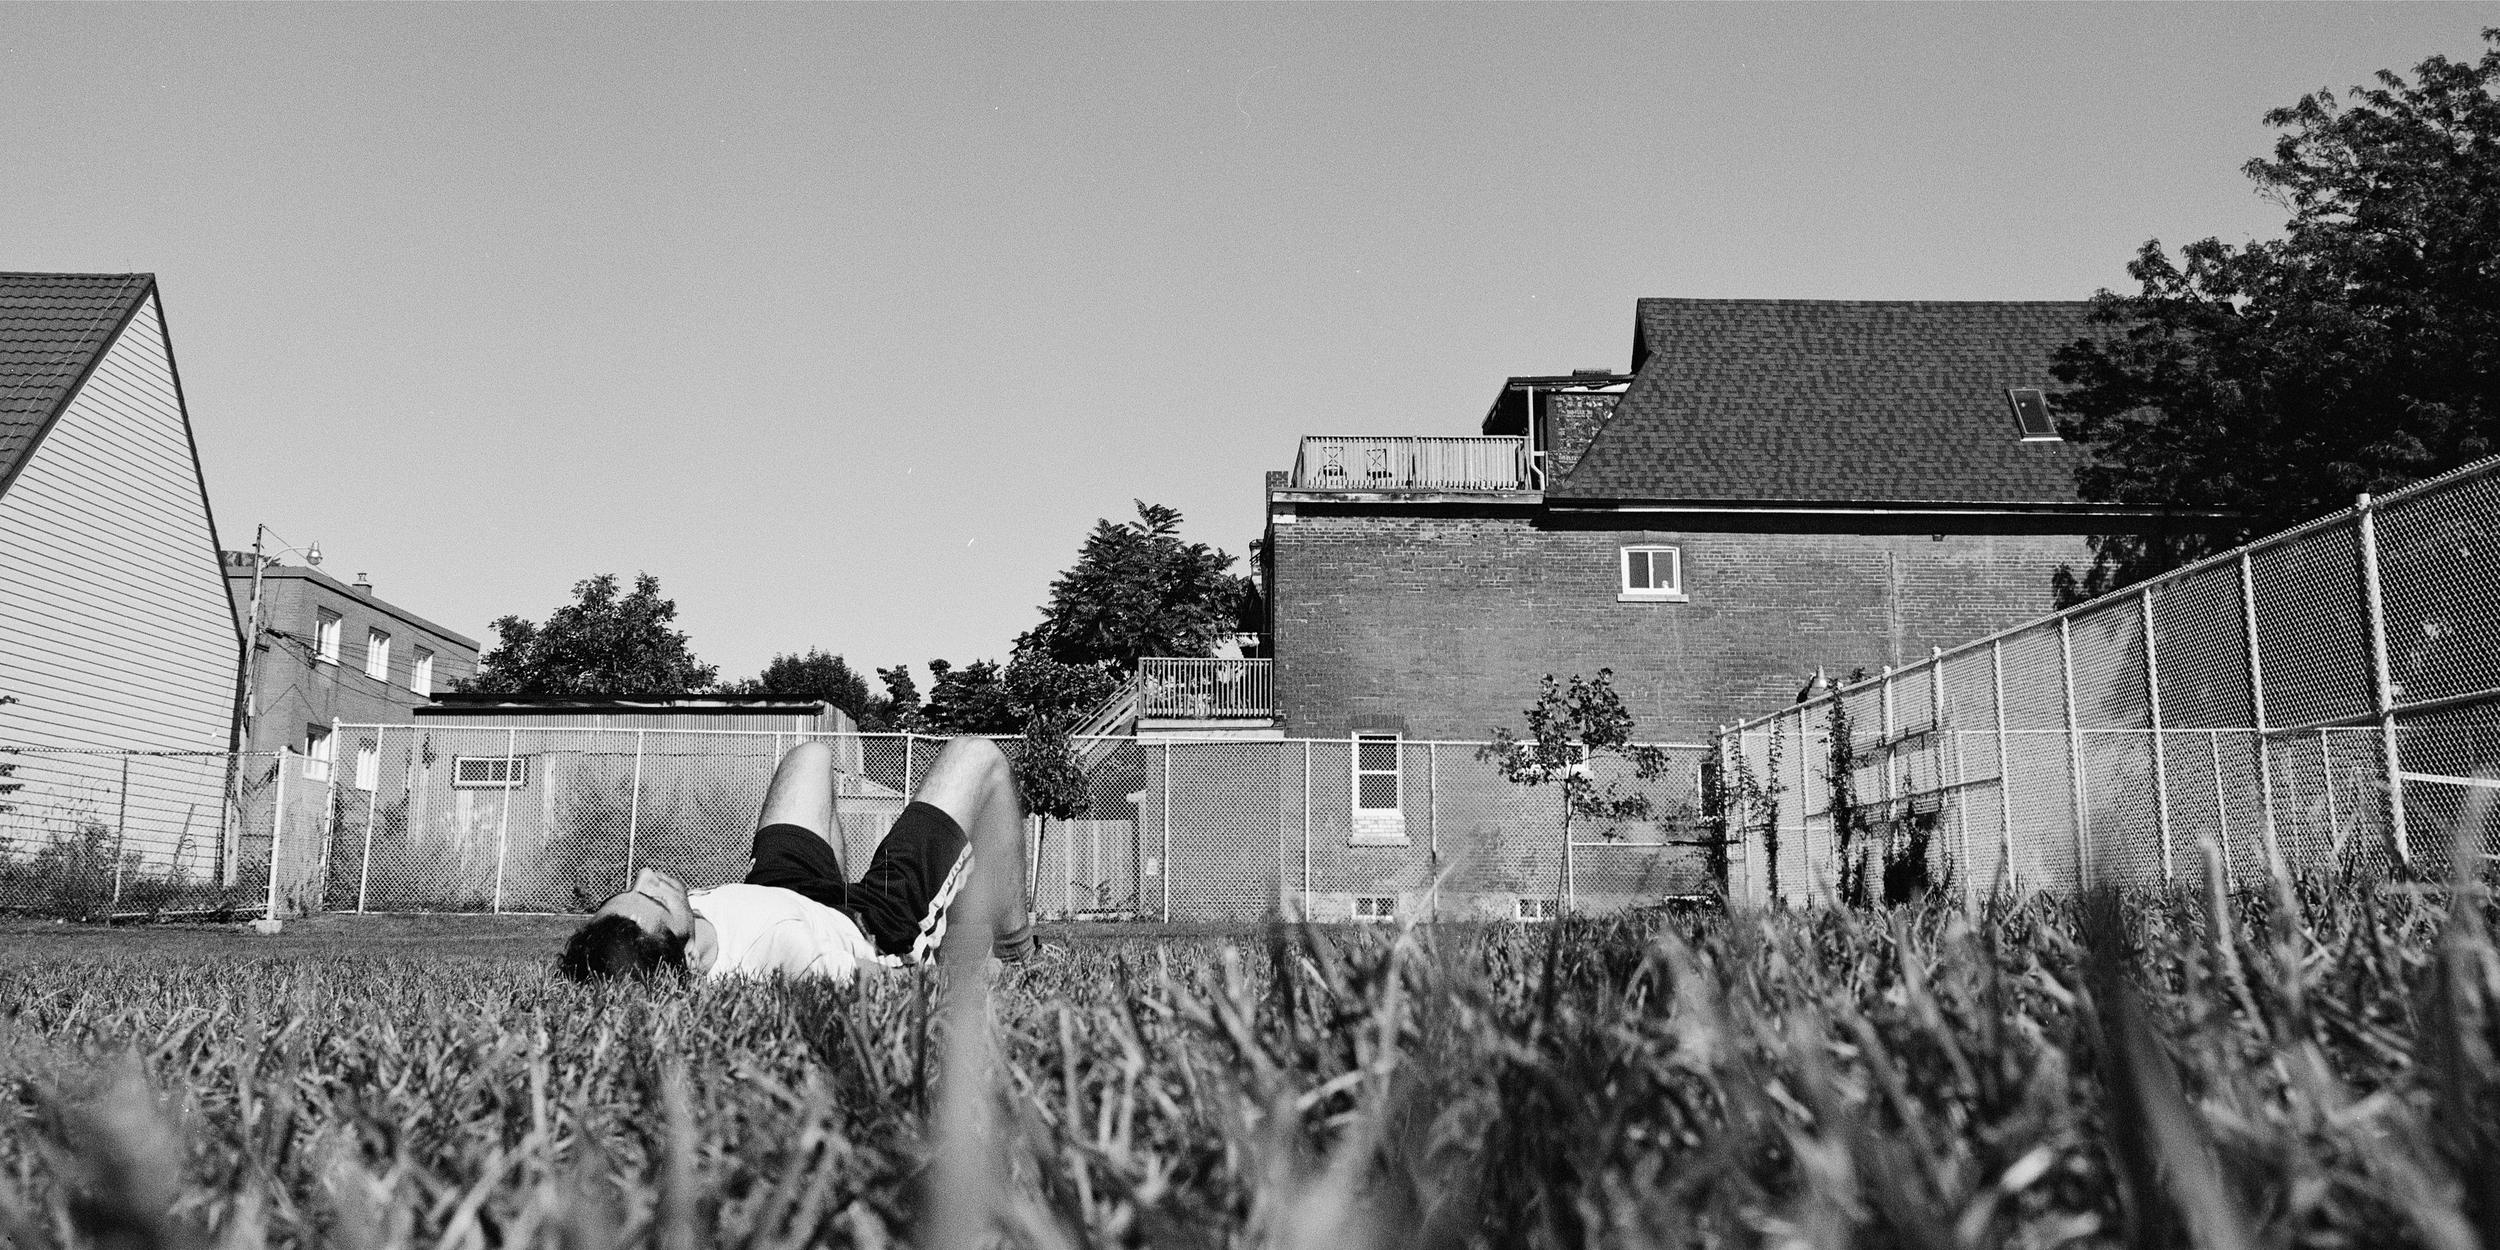 cinelone-toronto-120-35mm-film-kodak-photography-photographer-lauren-ashmore